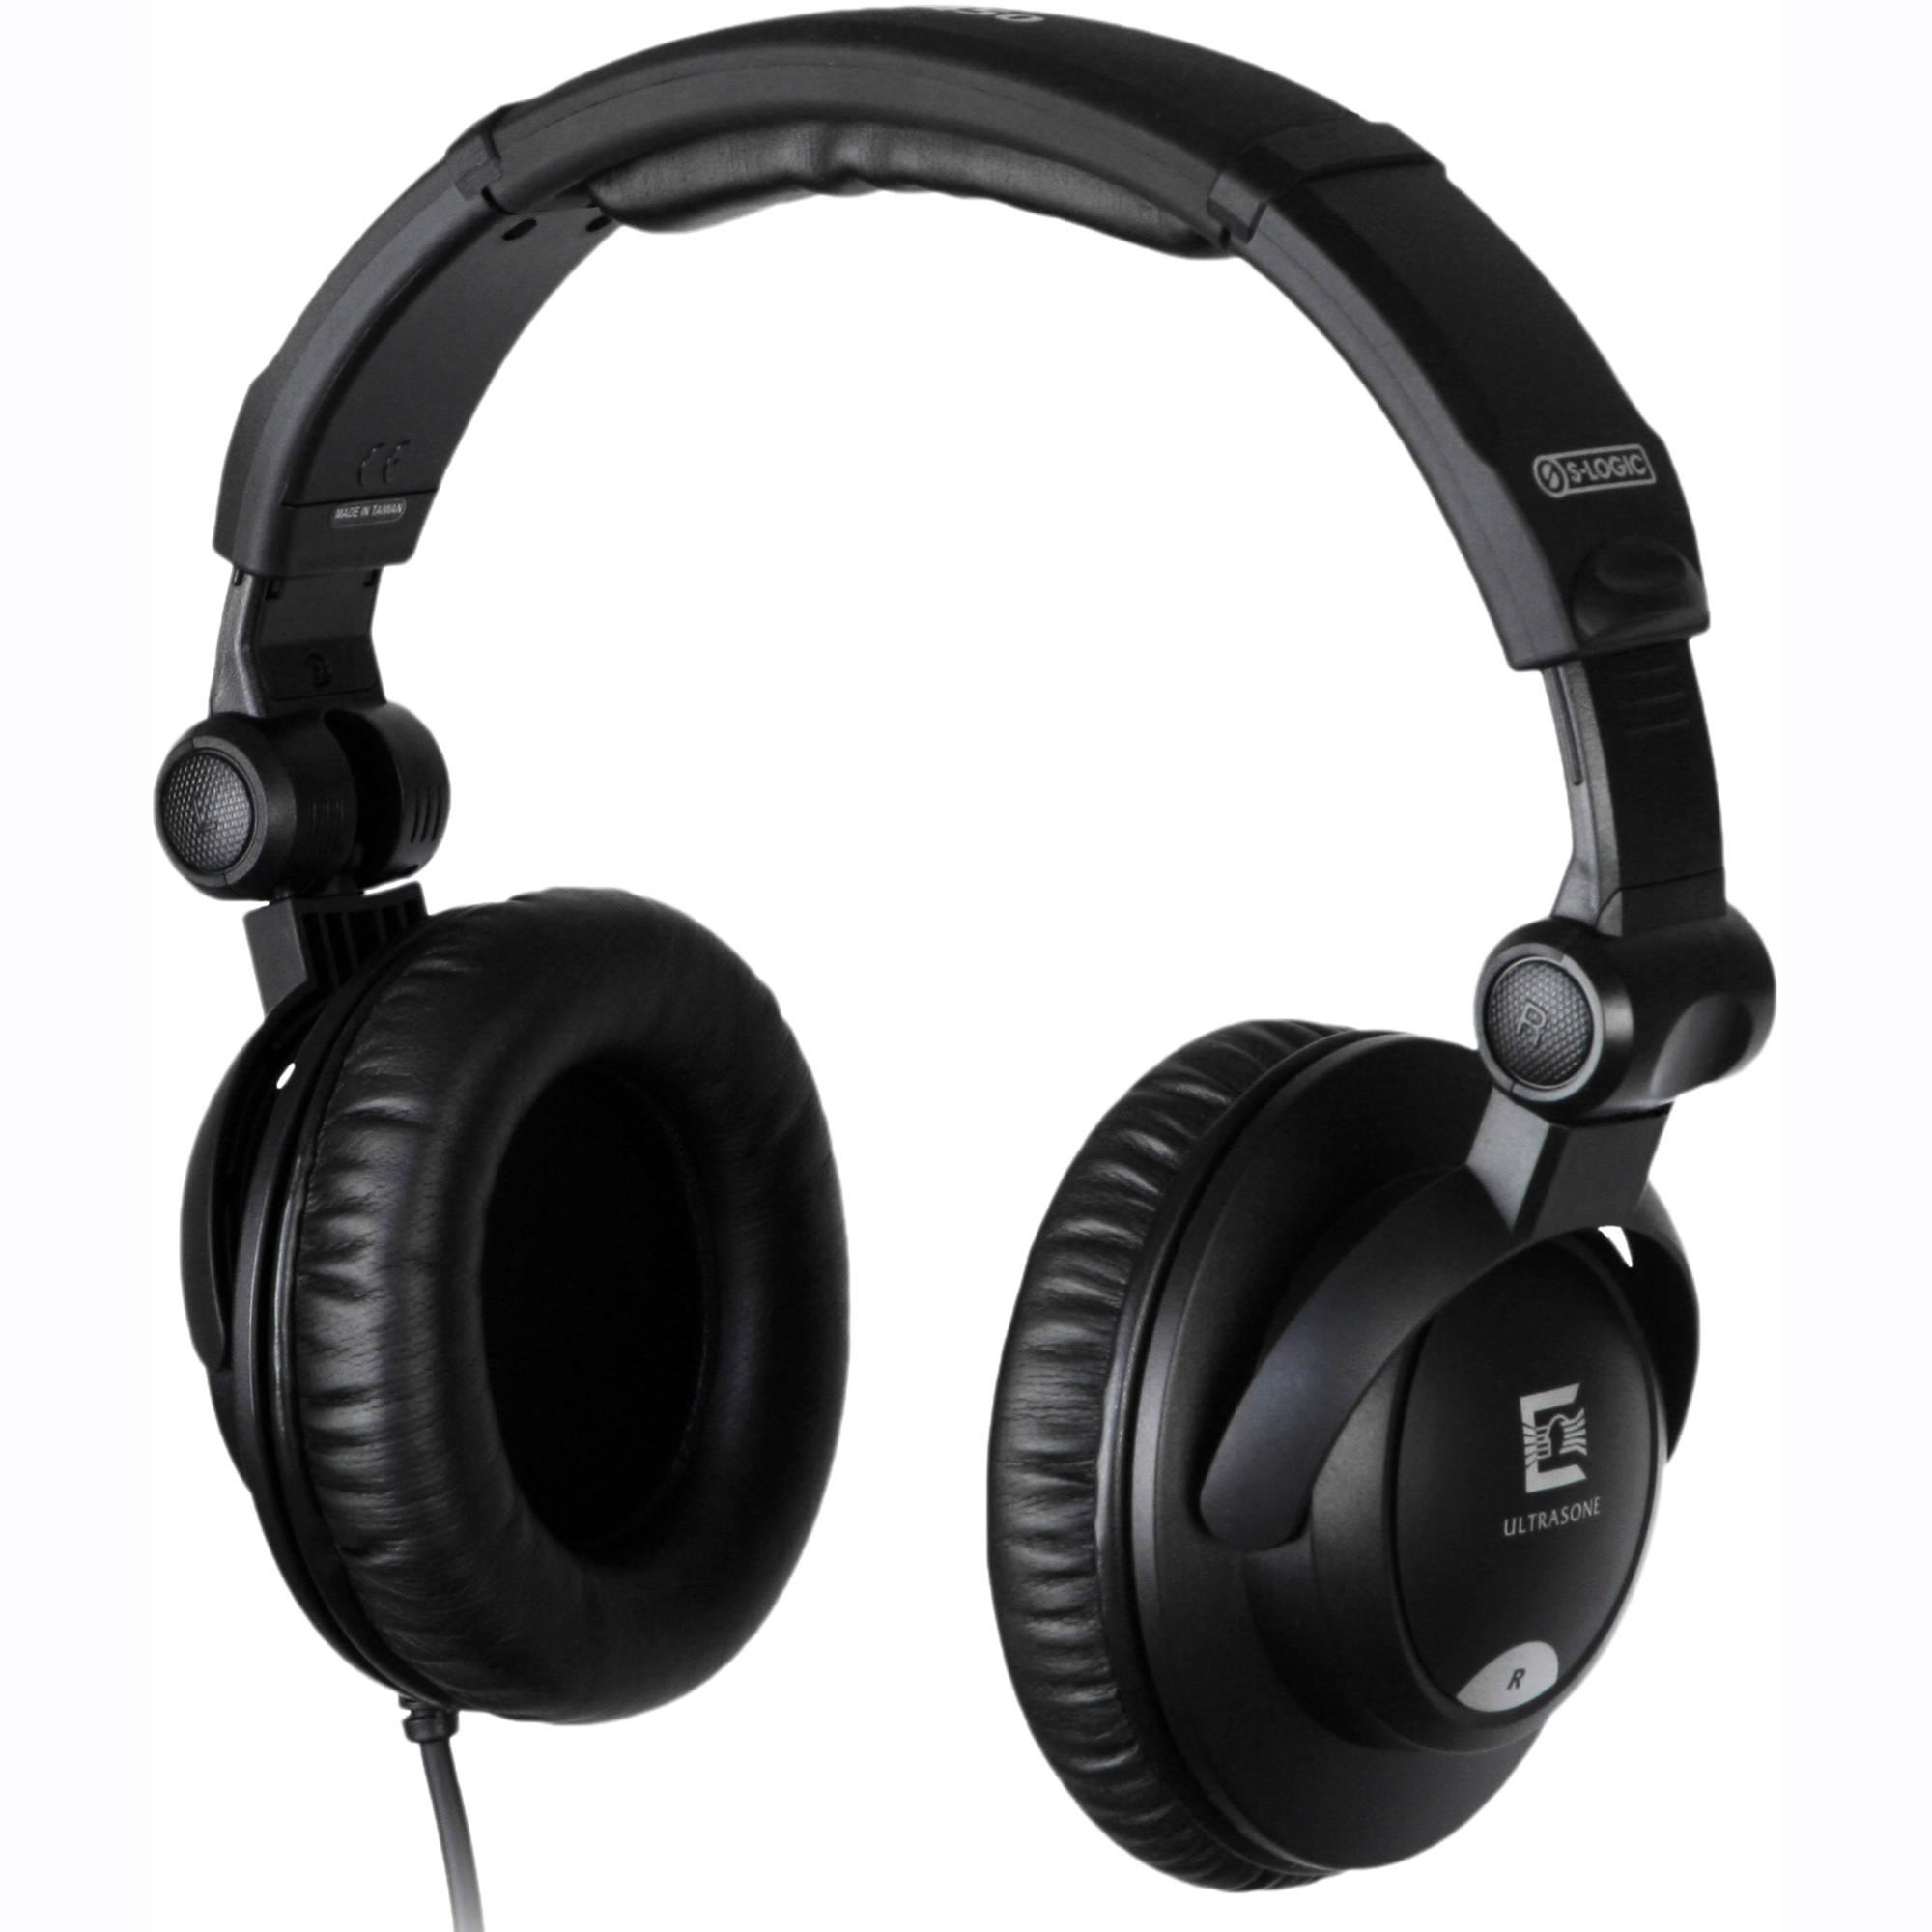 Wireless earphones headband - Ultrasone HFI review: Ultrasone HFI